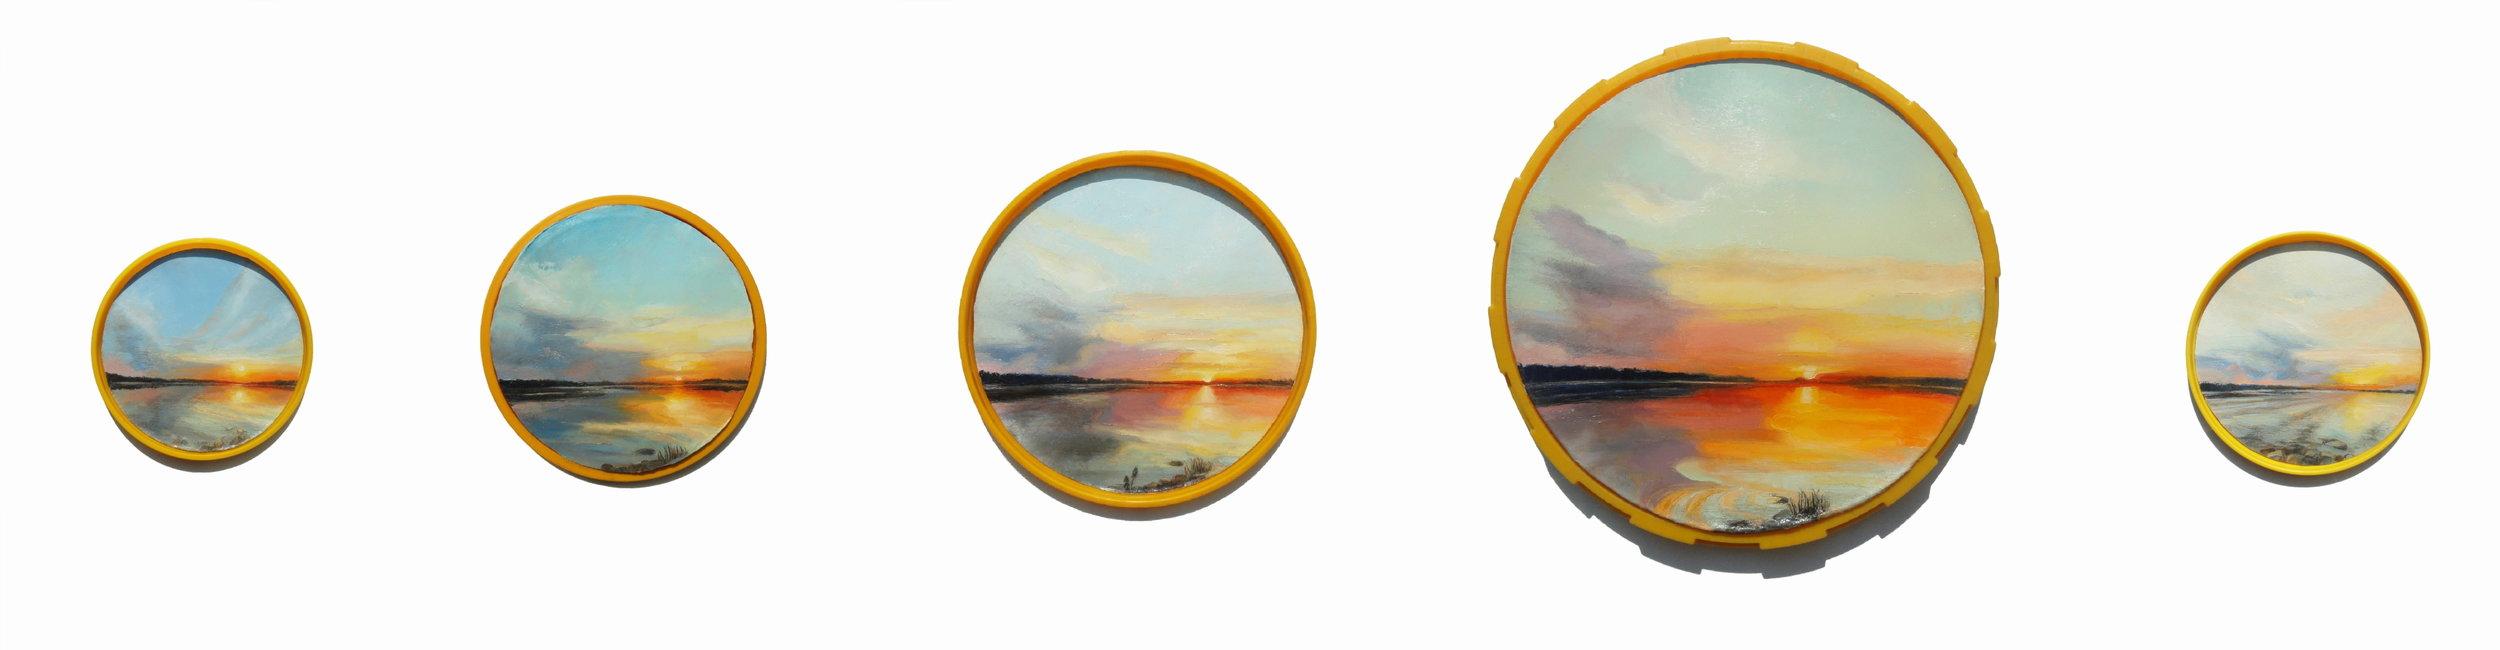 Inguna Gremzde, 33 Minutes Older, 13/15/19/28 cm in diameter; oil painting/ found plastic, 2016